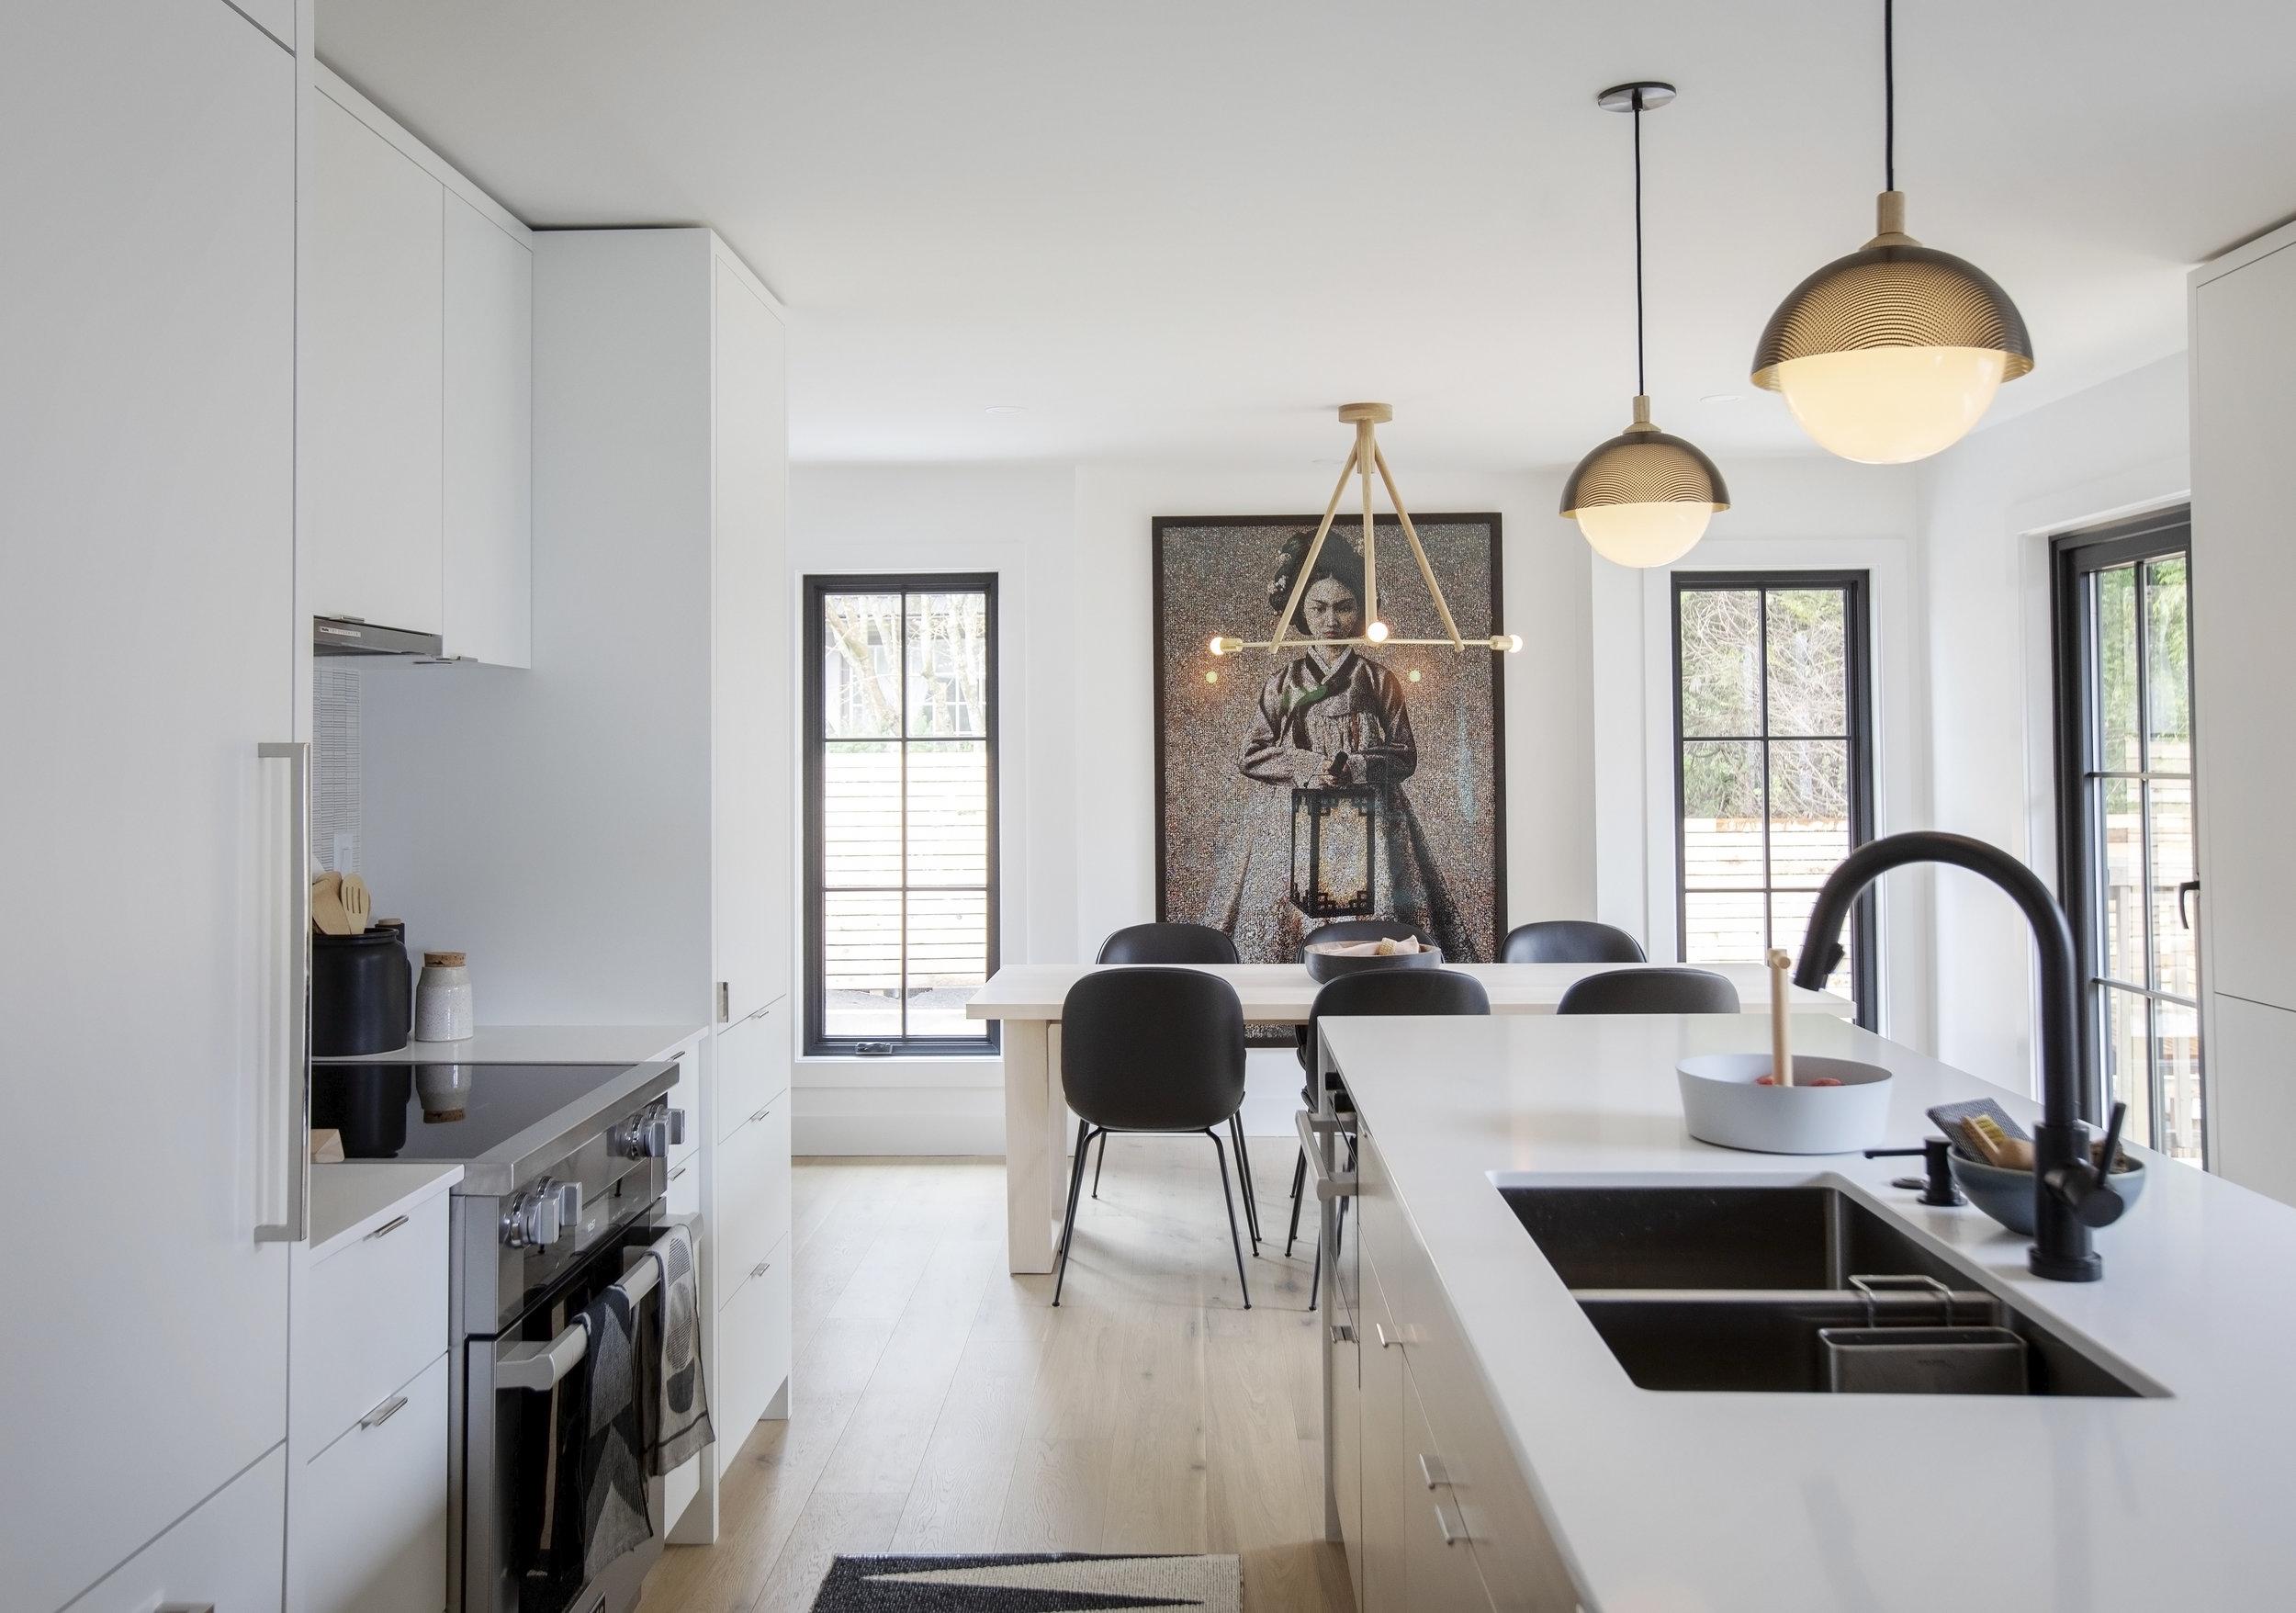 Alderfield Place home in West Van living room and kitchen